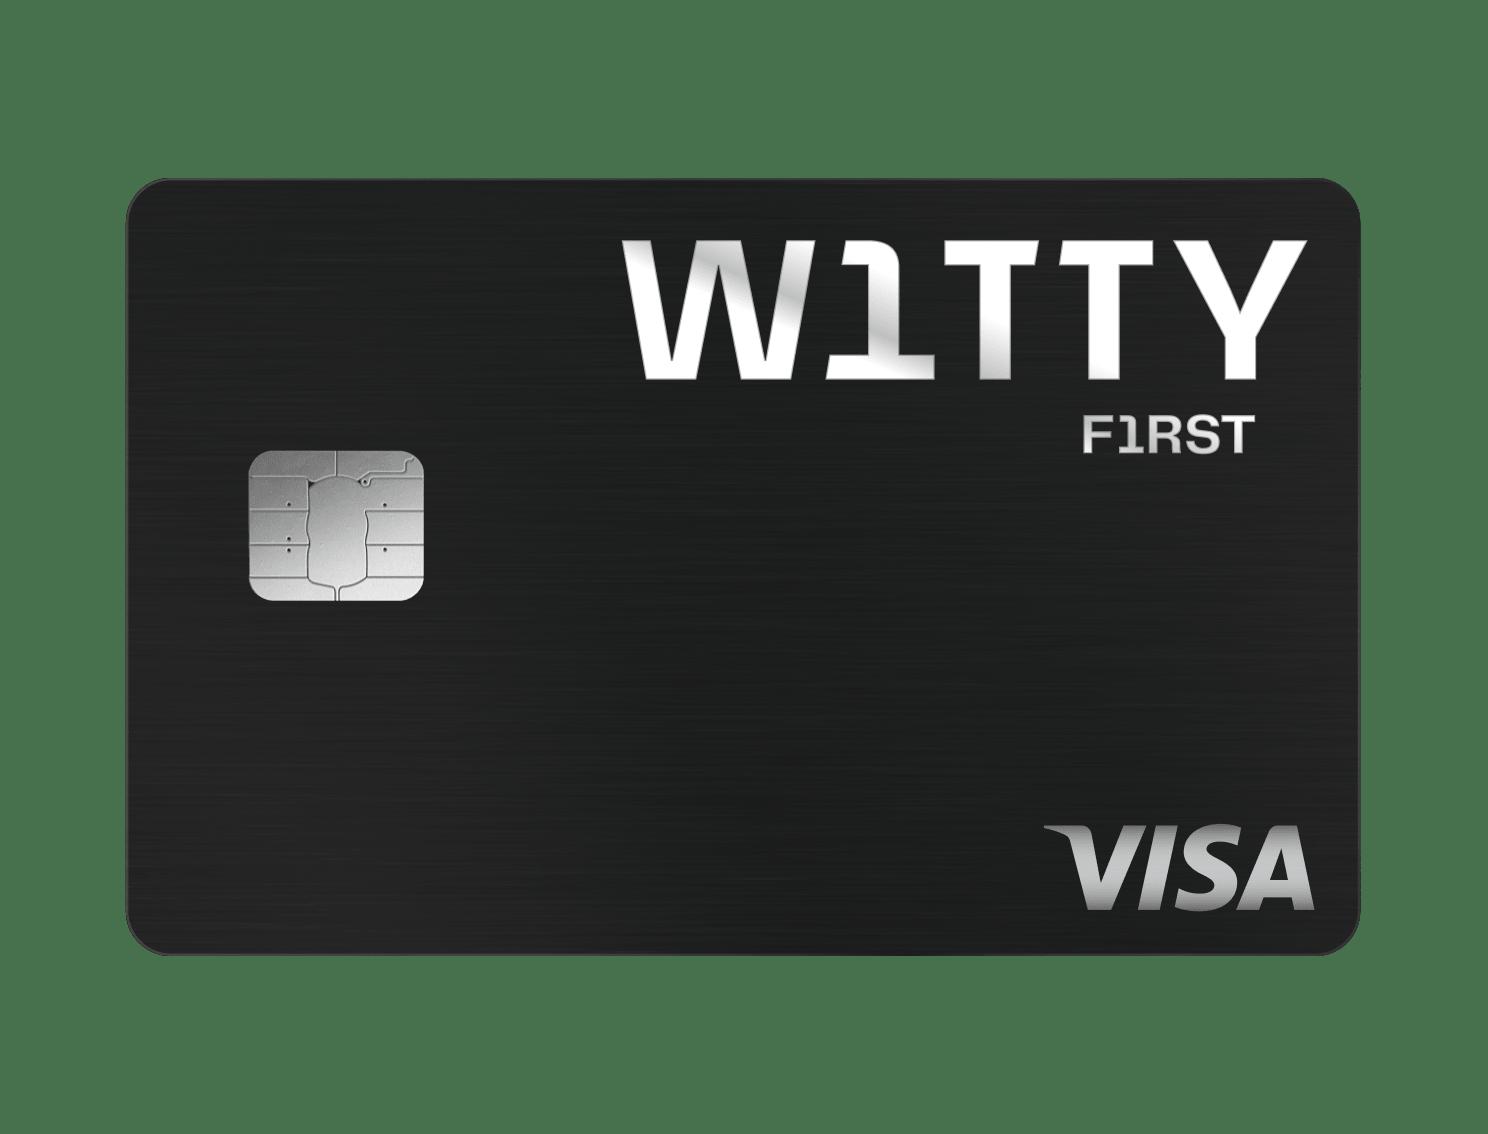 W1TTY First Card